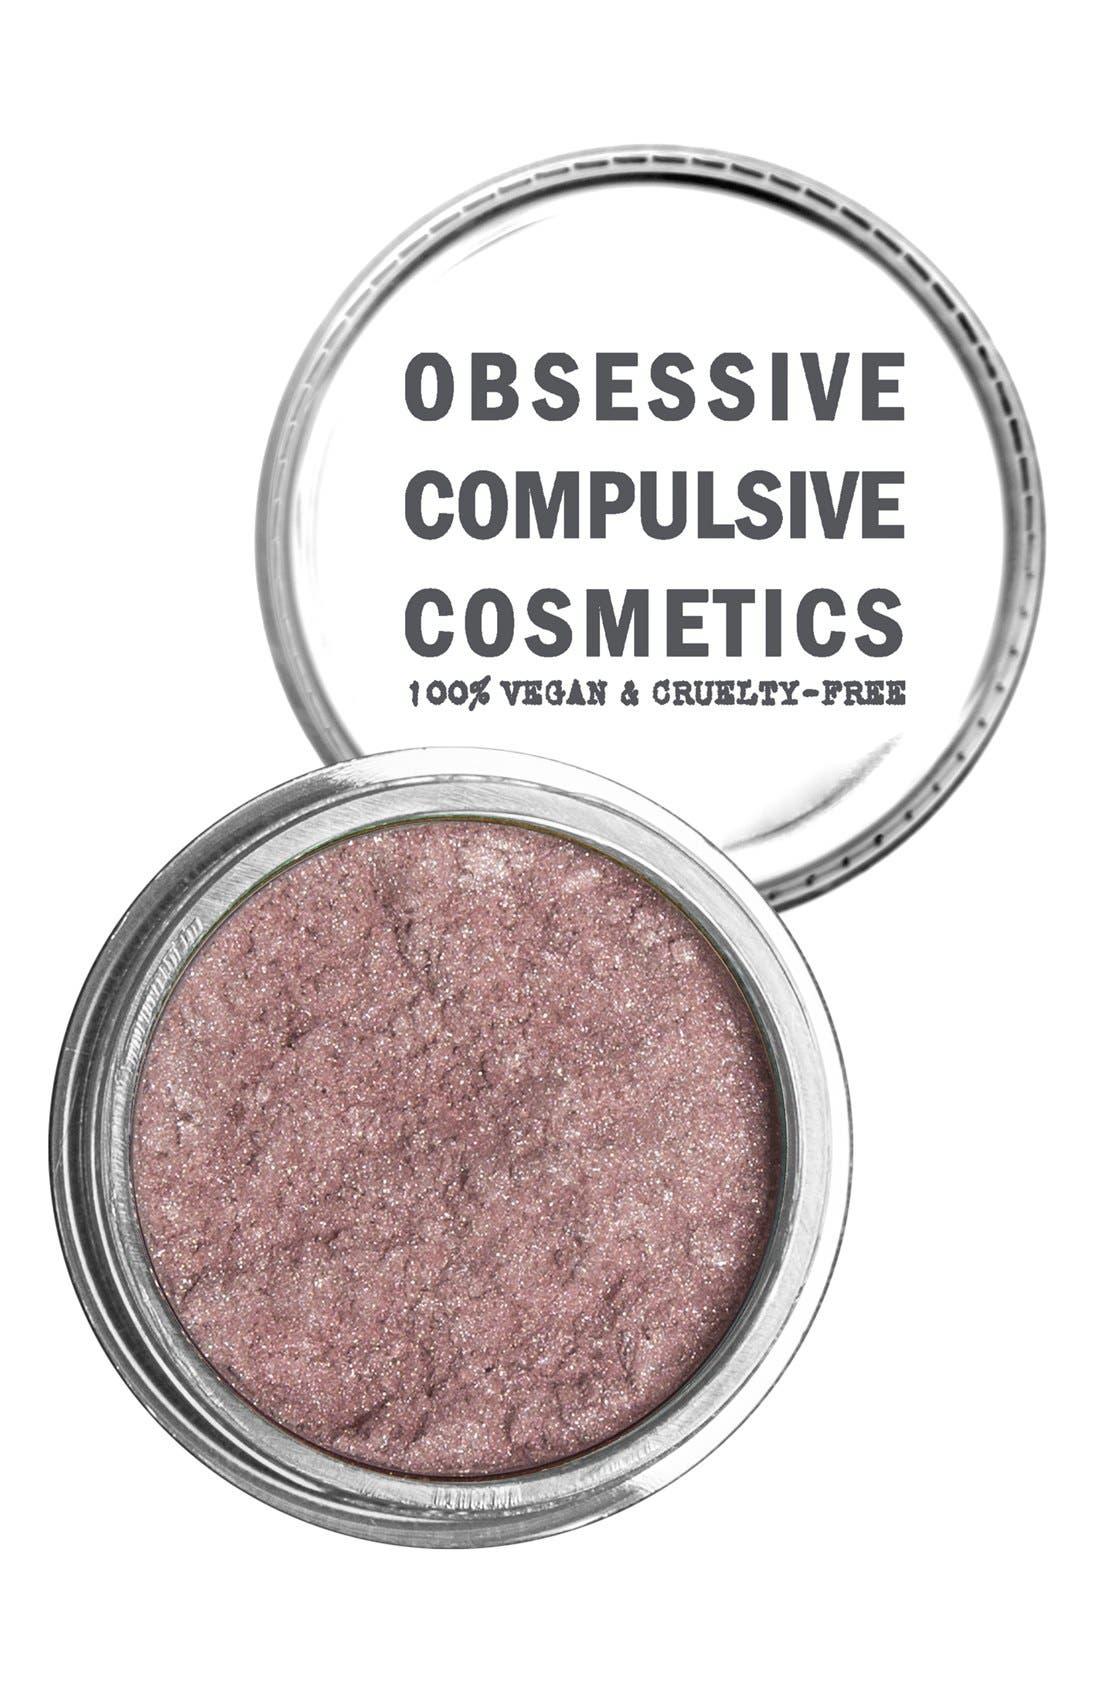 obsessive compulsive cosmetics sverige